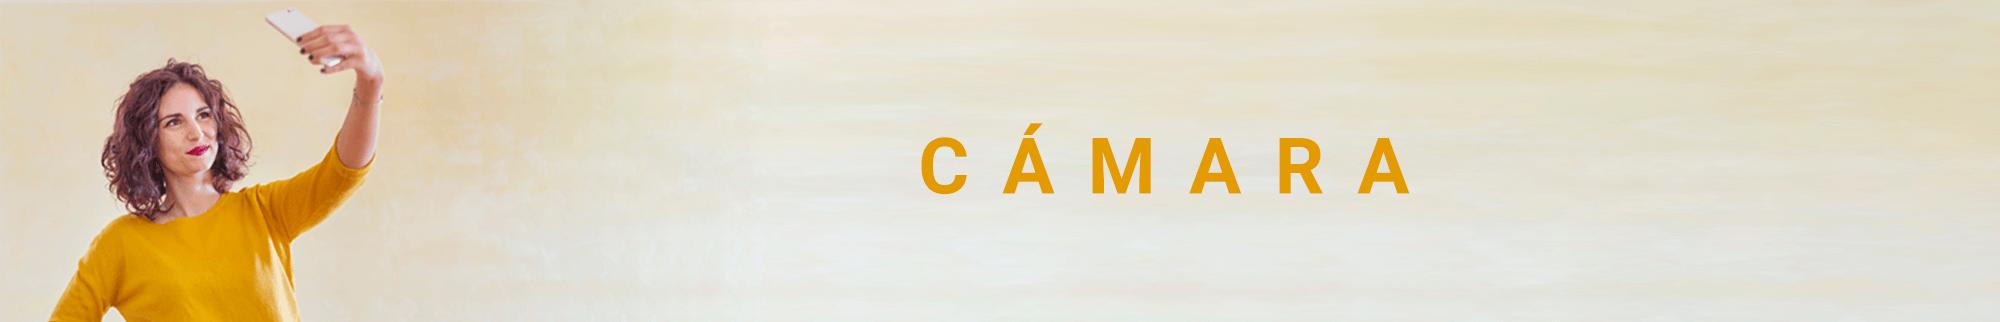 camara-alcatel-1x-2019.png